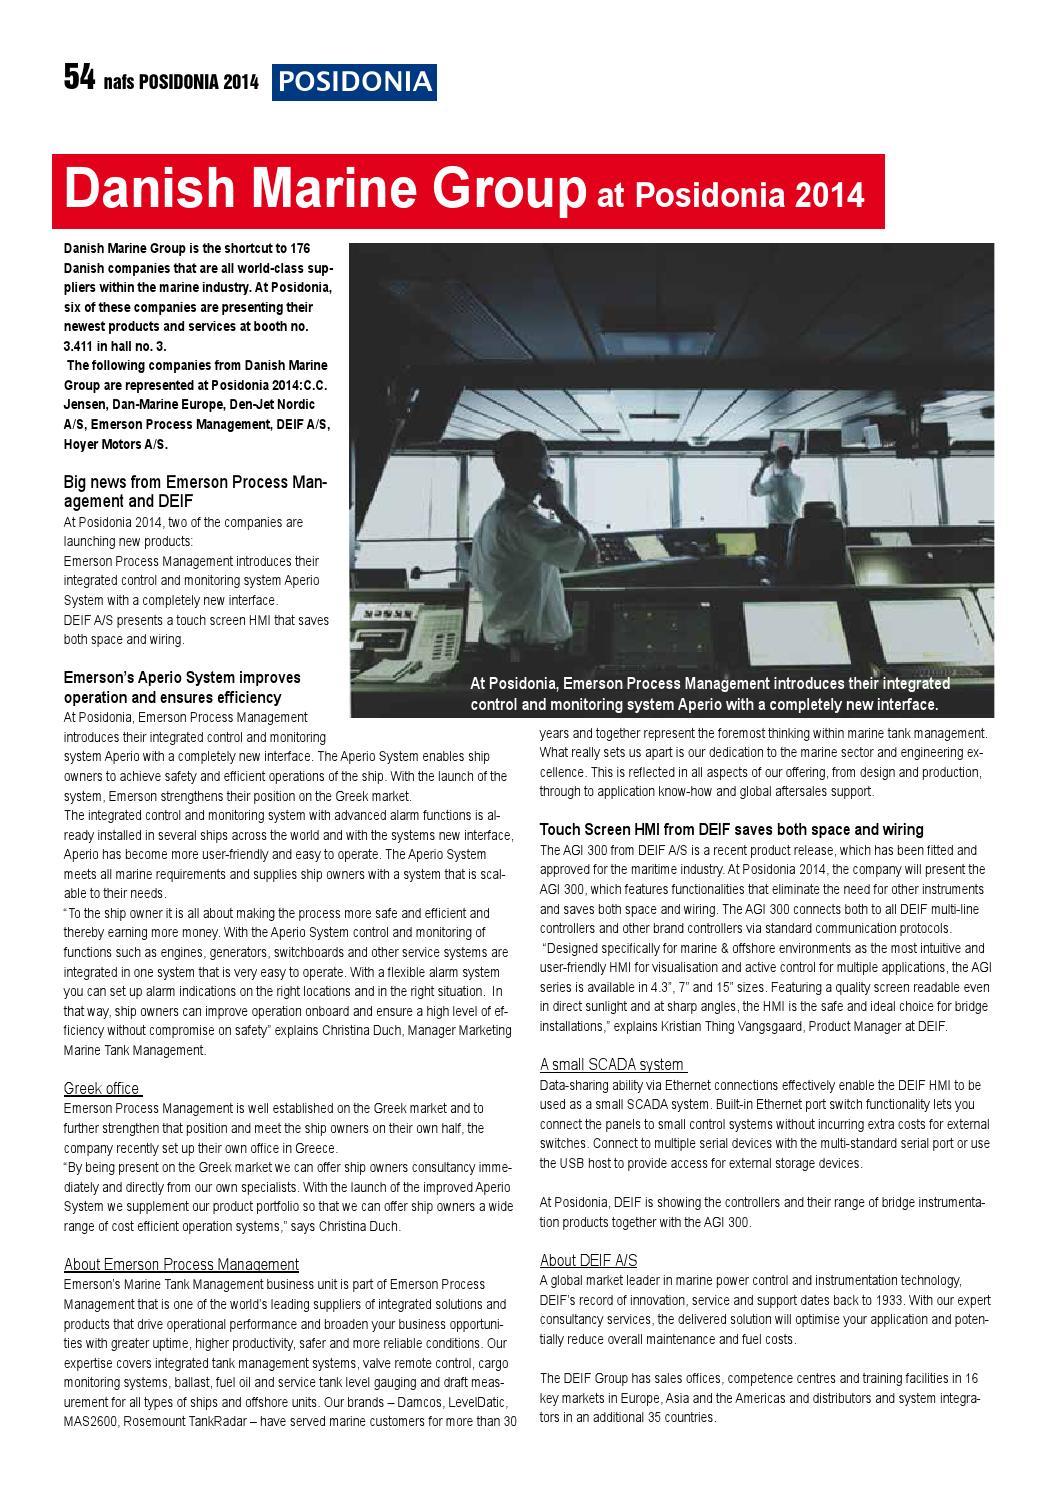 Nafs june 2014 by NAFS magazine - issuu